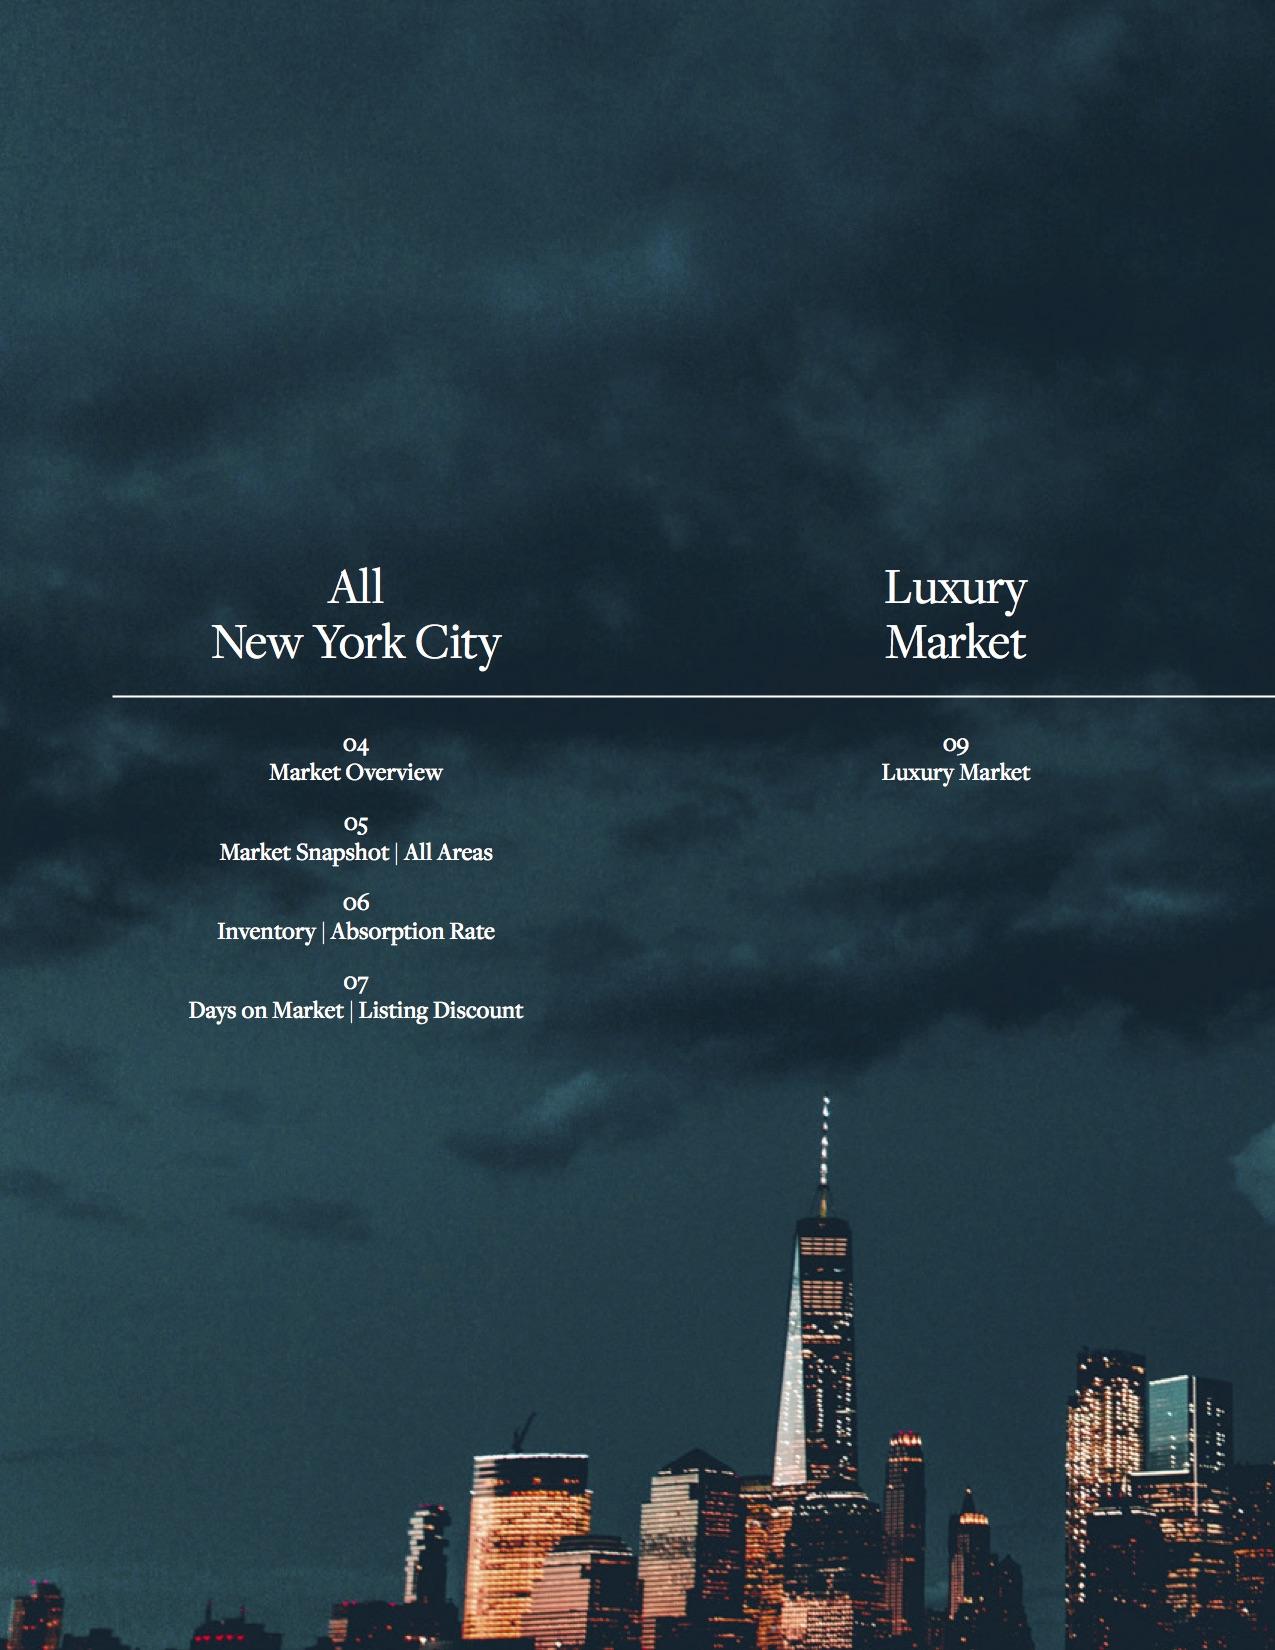 SIR New York City Real Estate Market Report_2.jpg